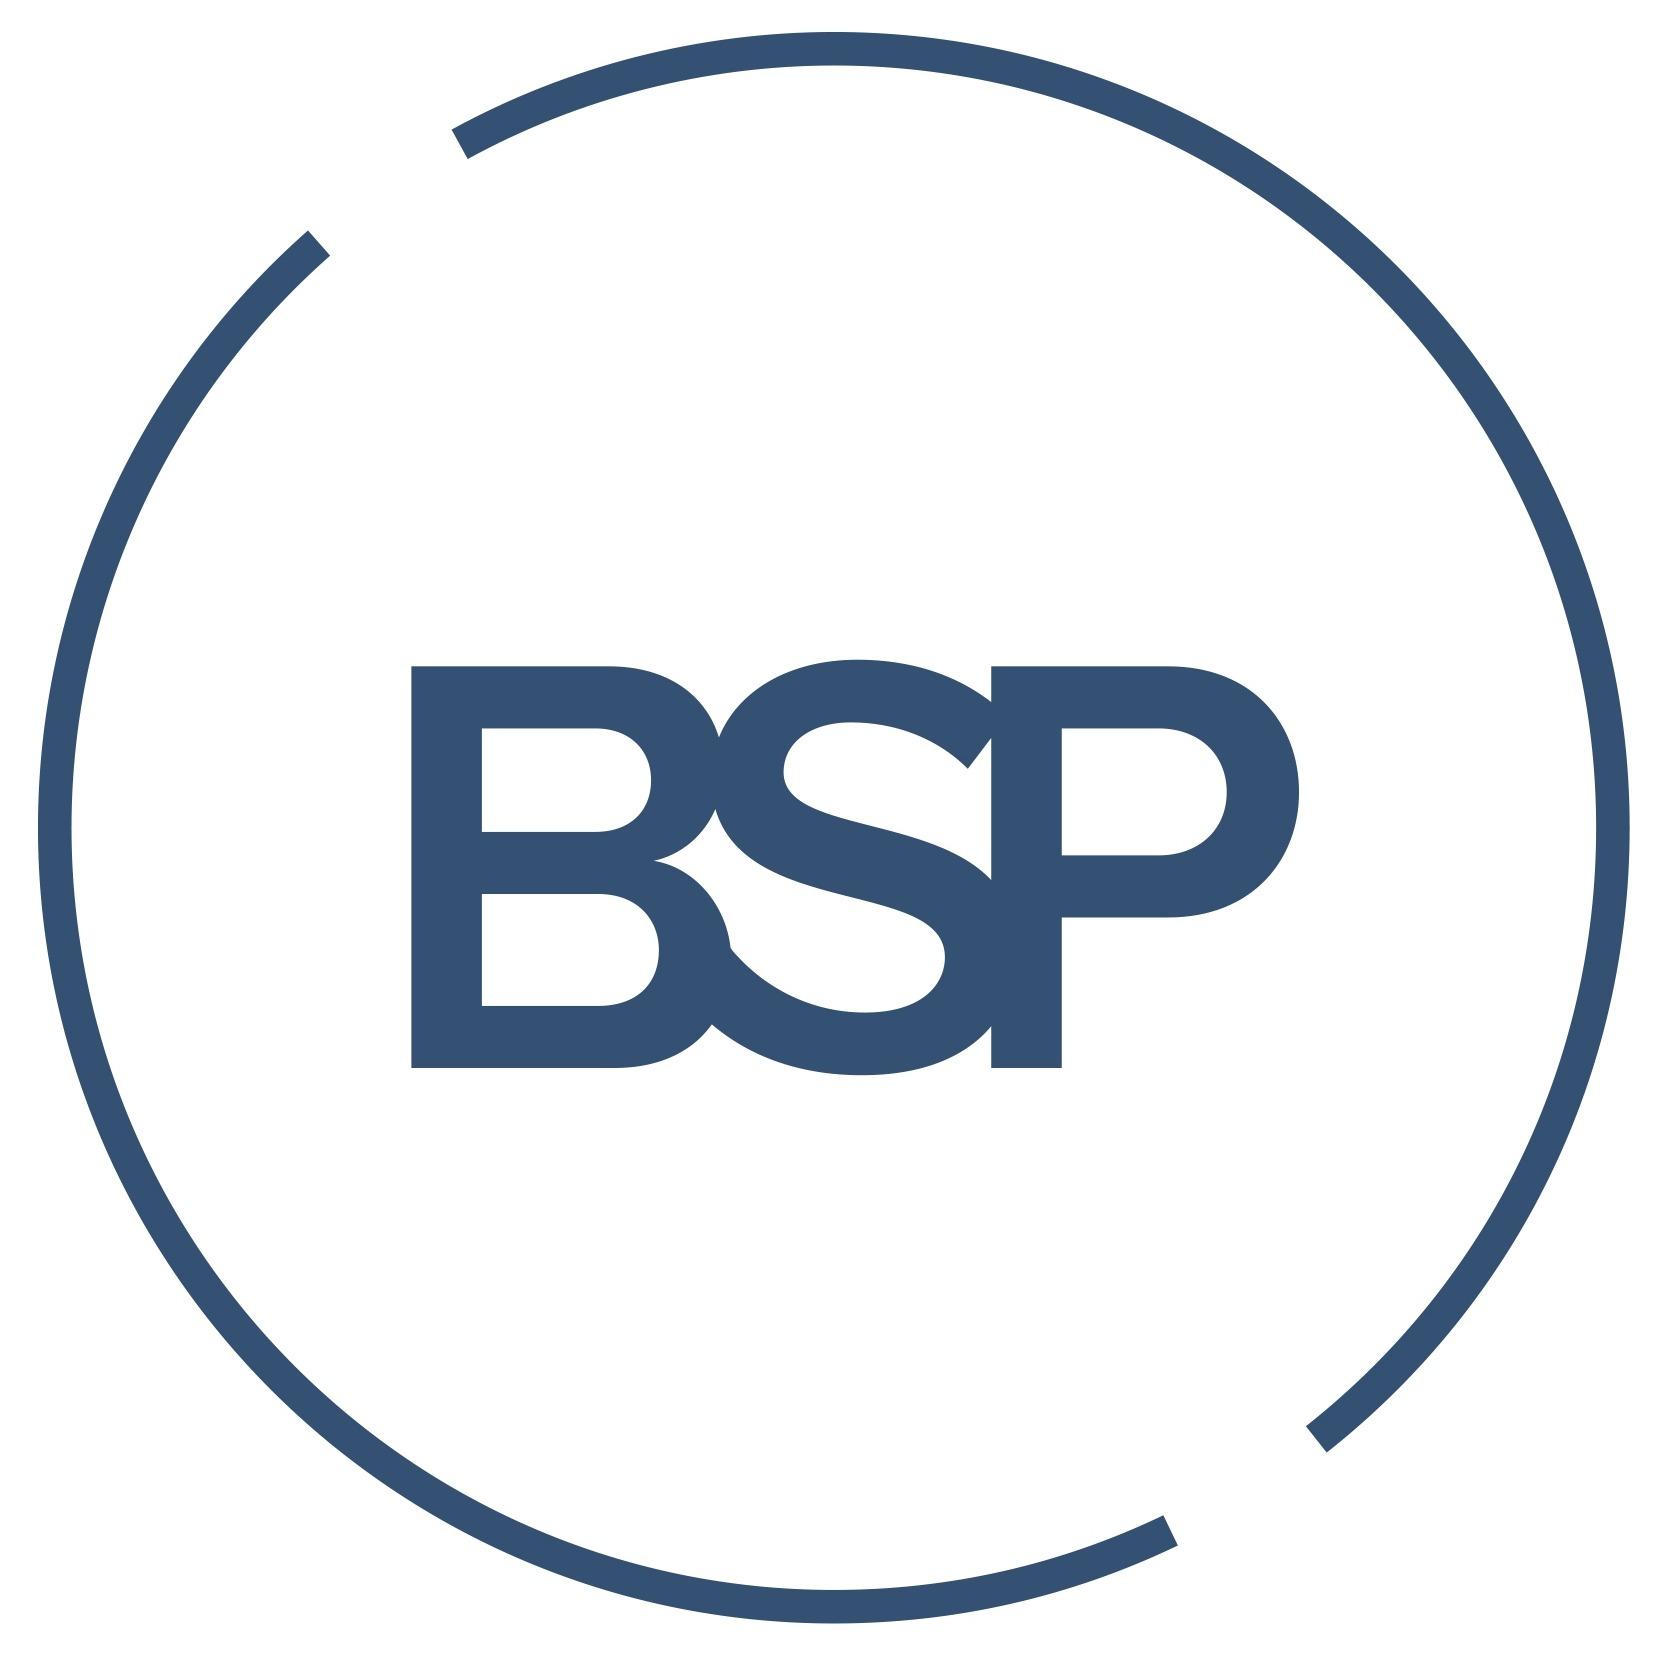 the BSP logo.